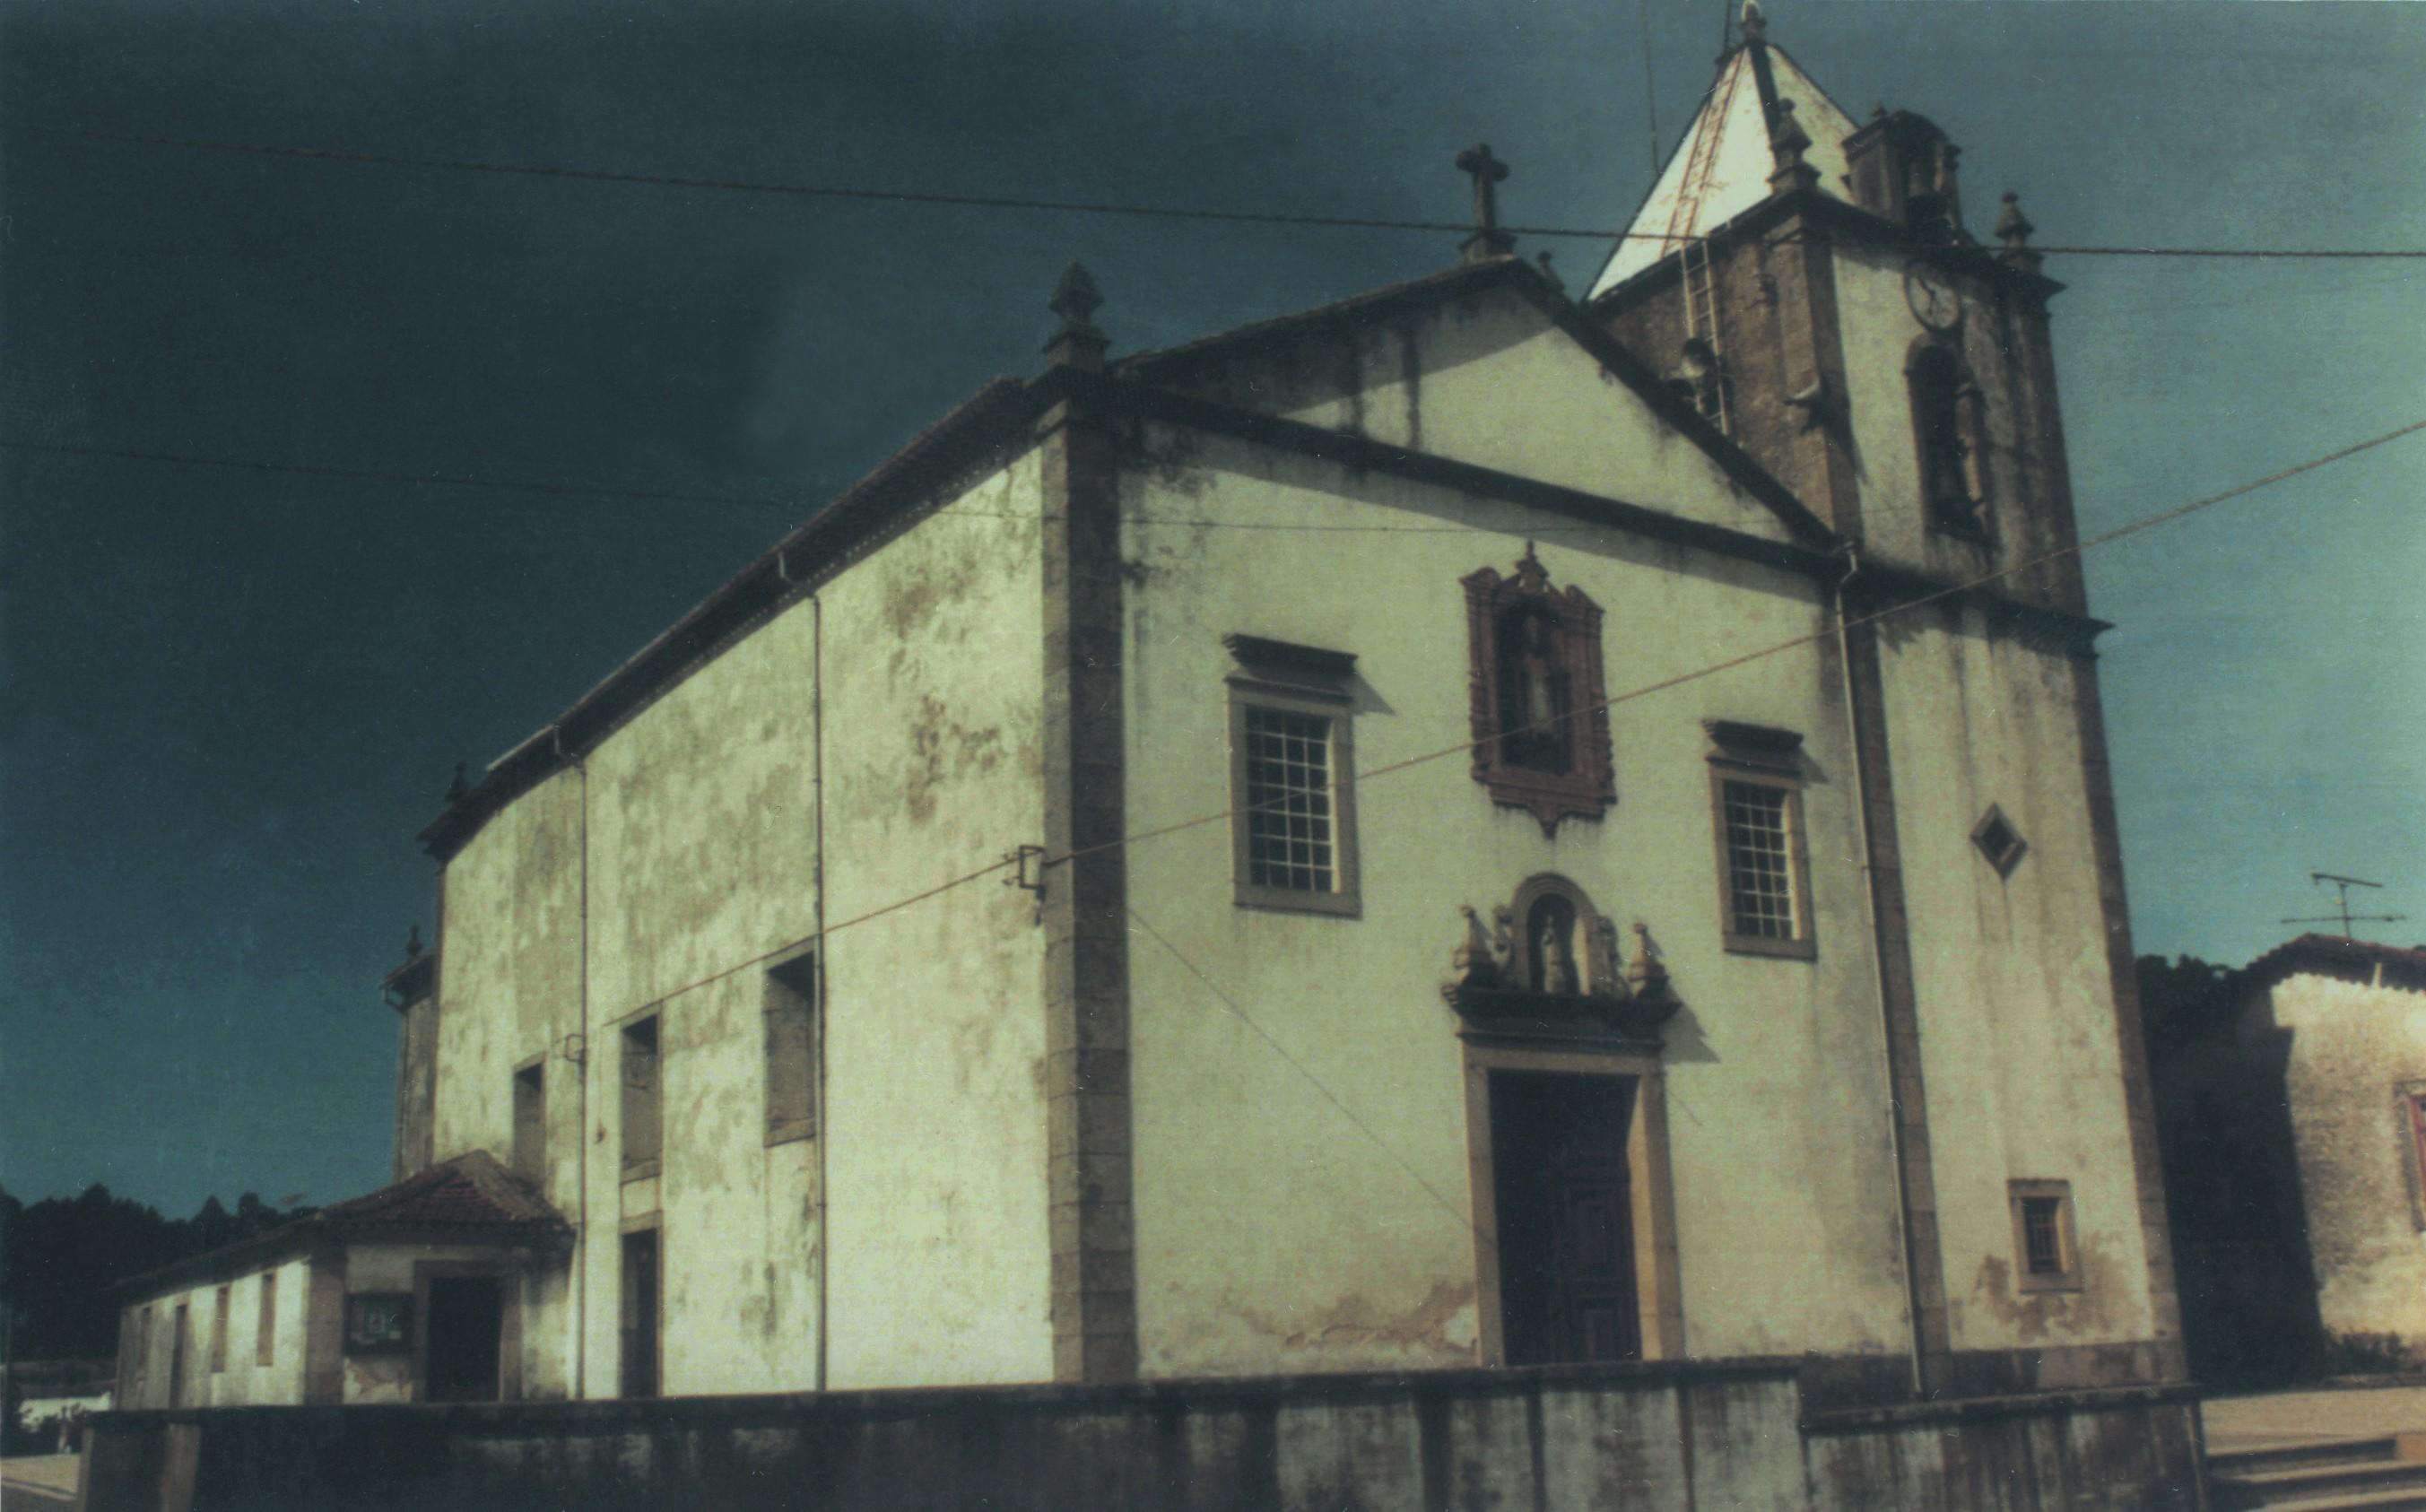 Igreja matriz de Fajões (1984)